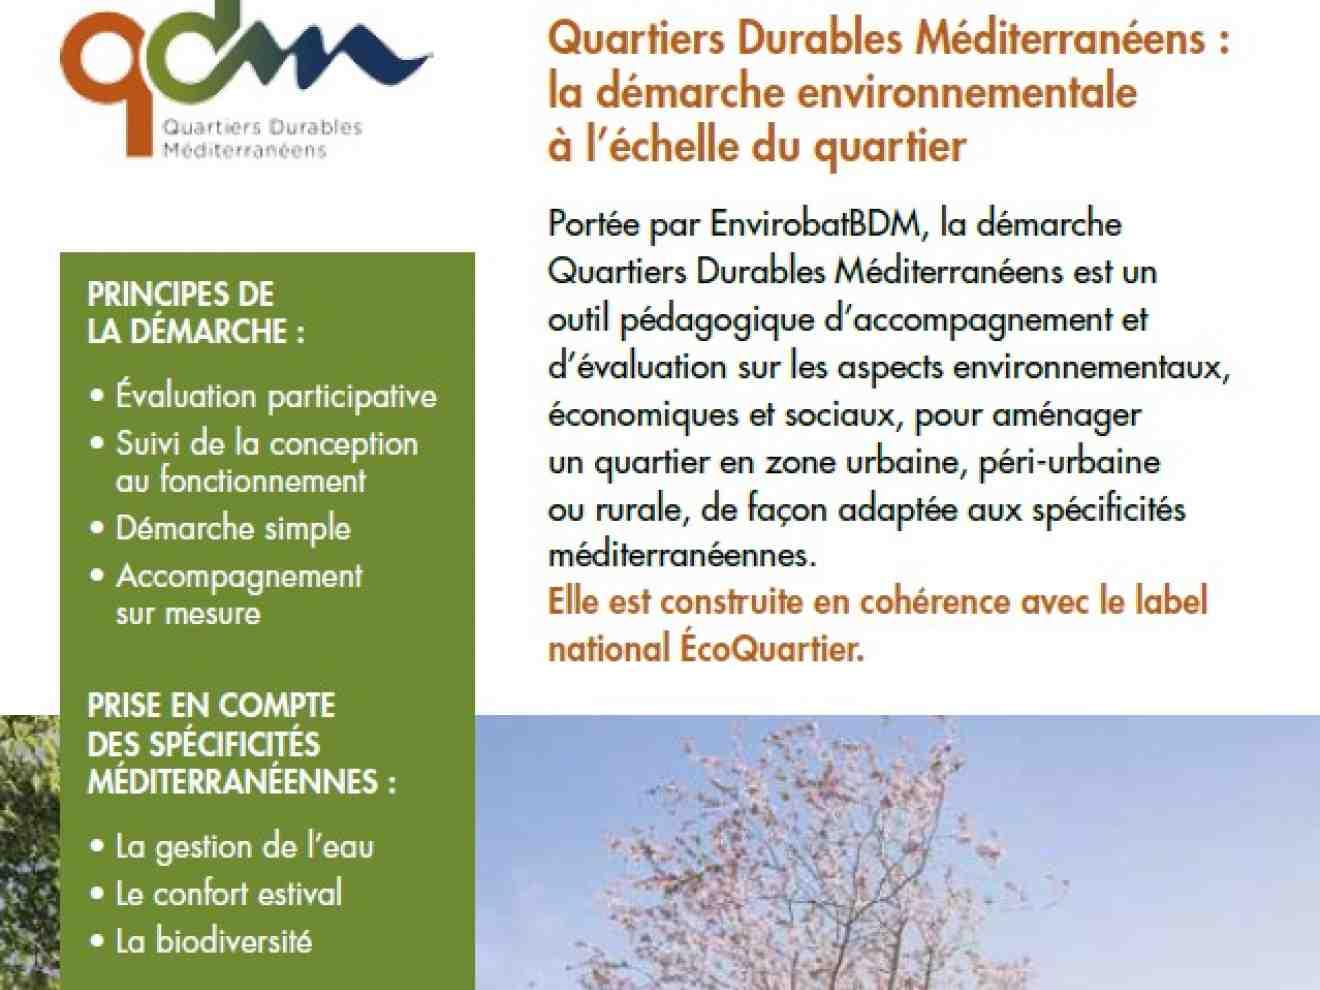 Quartiers durables méditerranéens